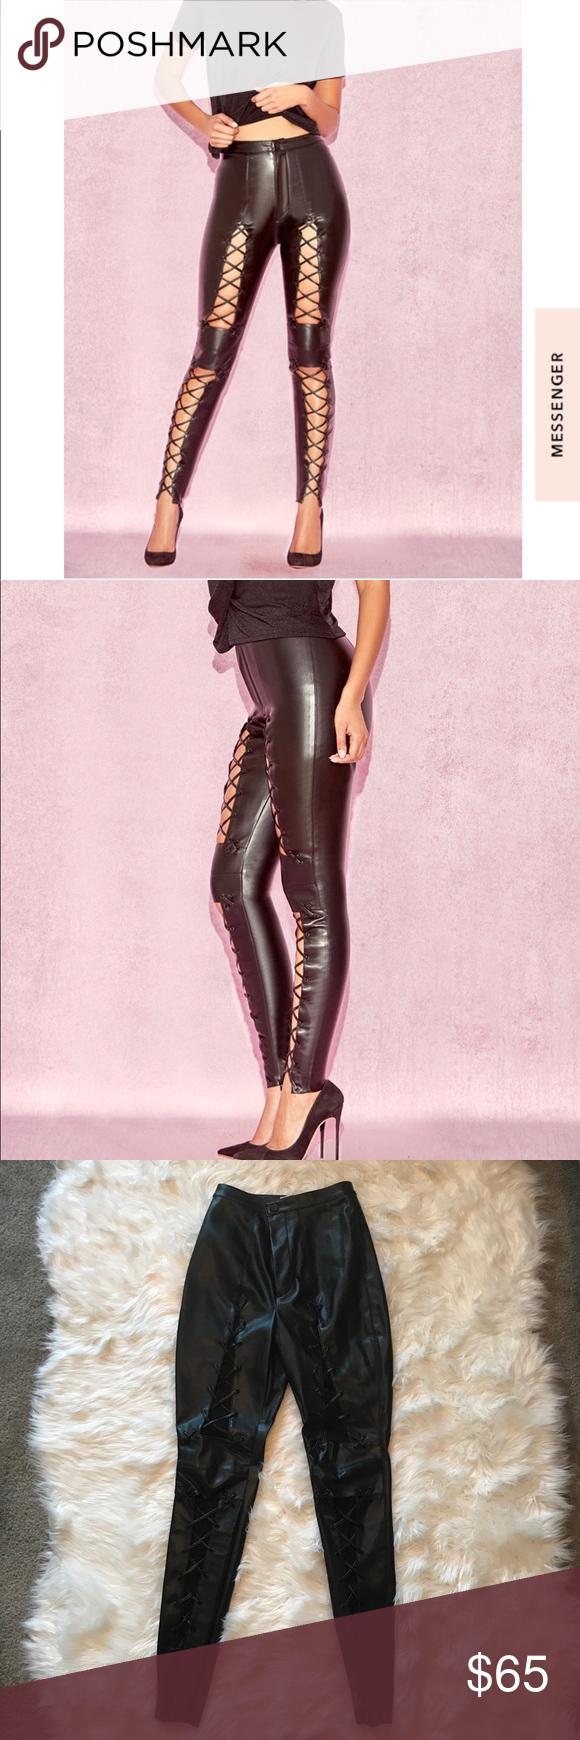 House Of Cb Black Vegan Leather Lace Up Pants Leather And Lace Vegan Leather High Waisted Pants